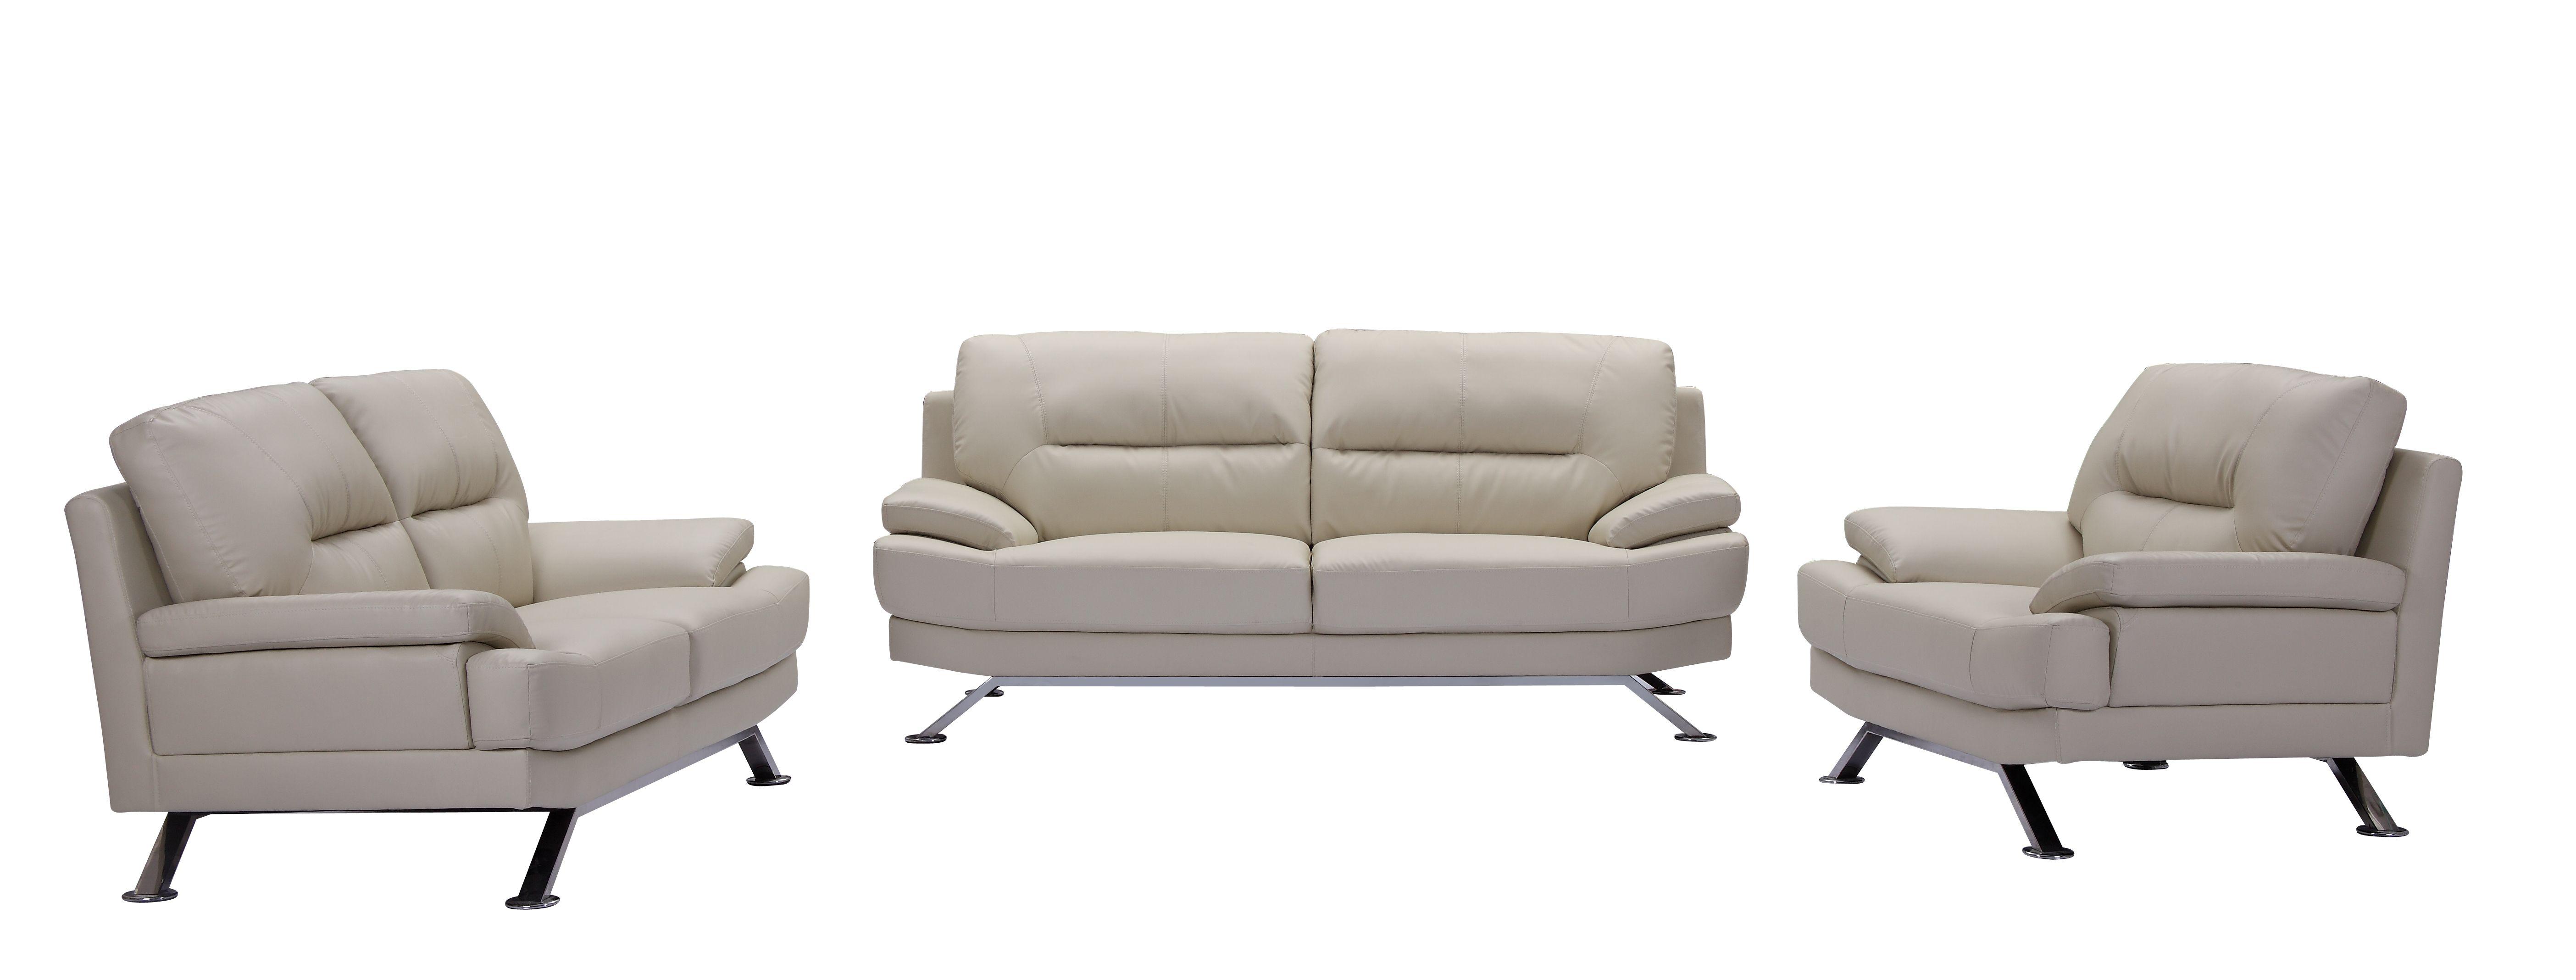 Cream Leather Sofa Set - 3+2+1 Cream Leather Sofa Set